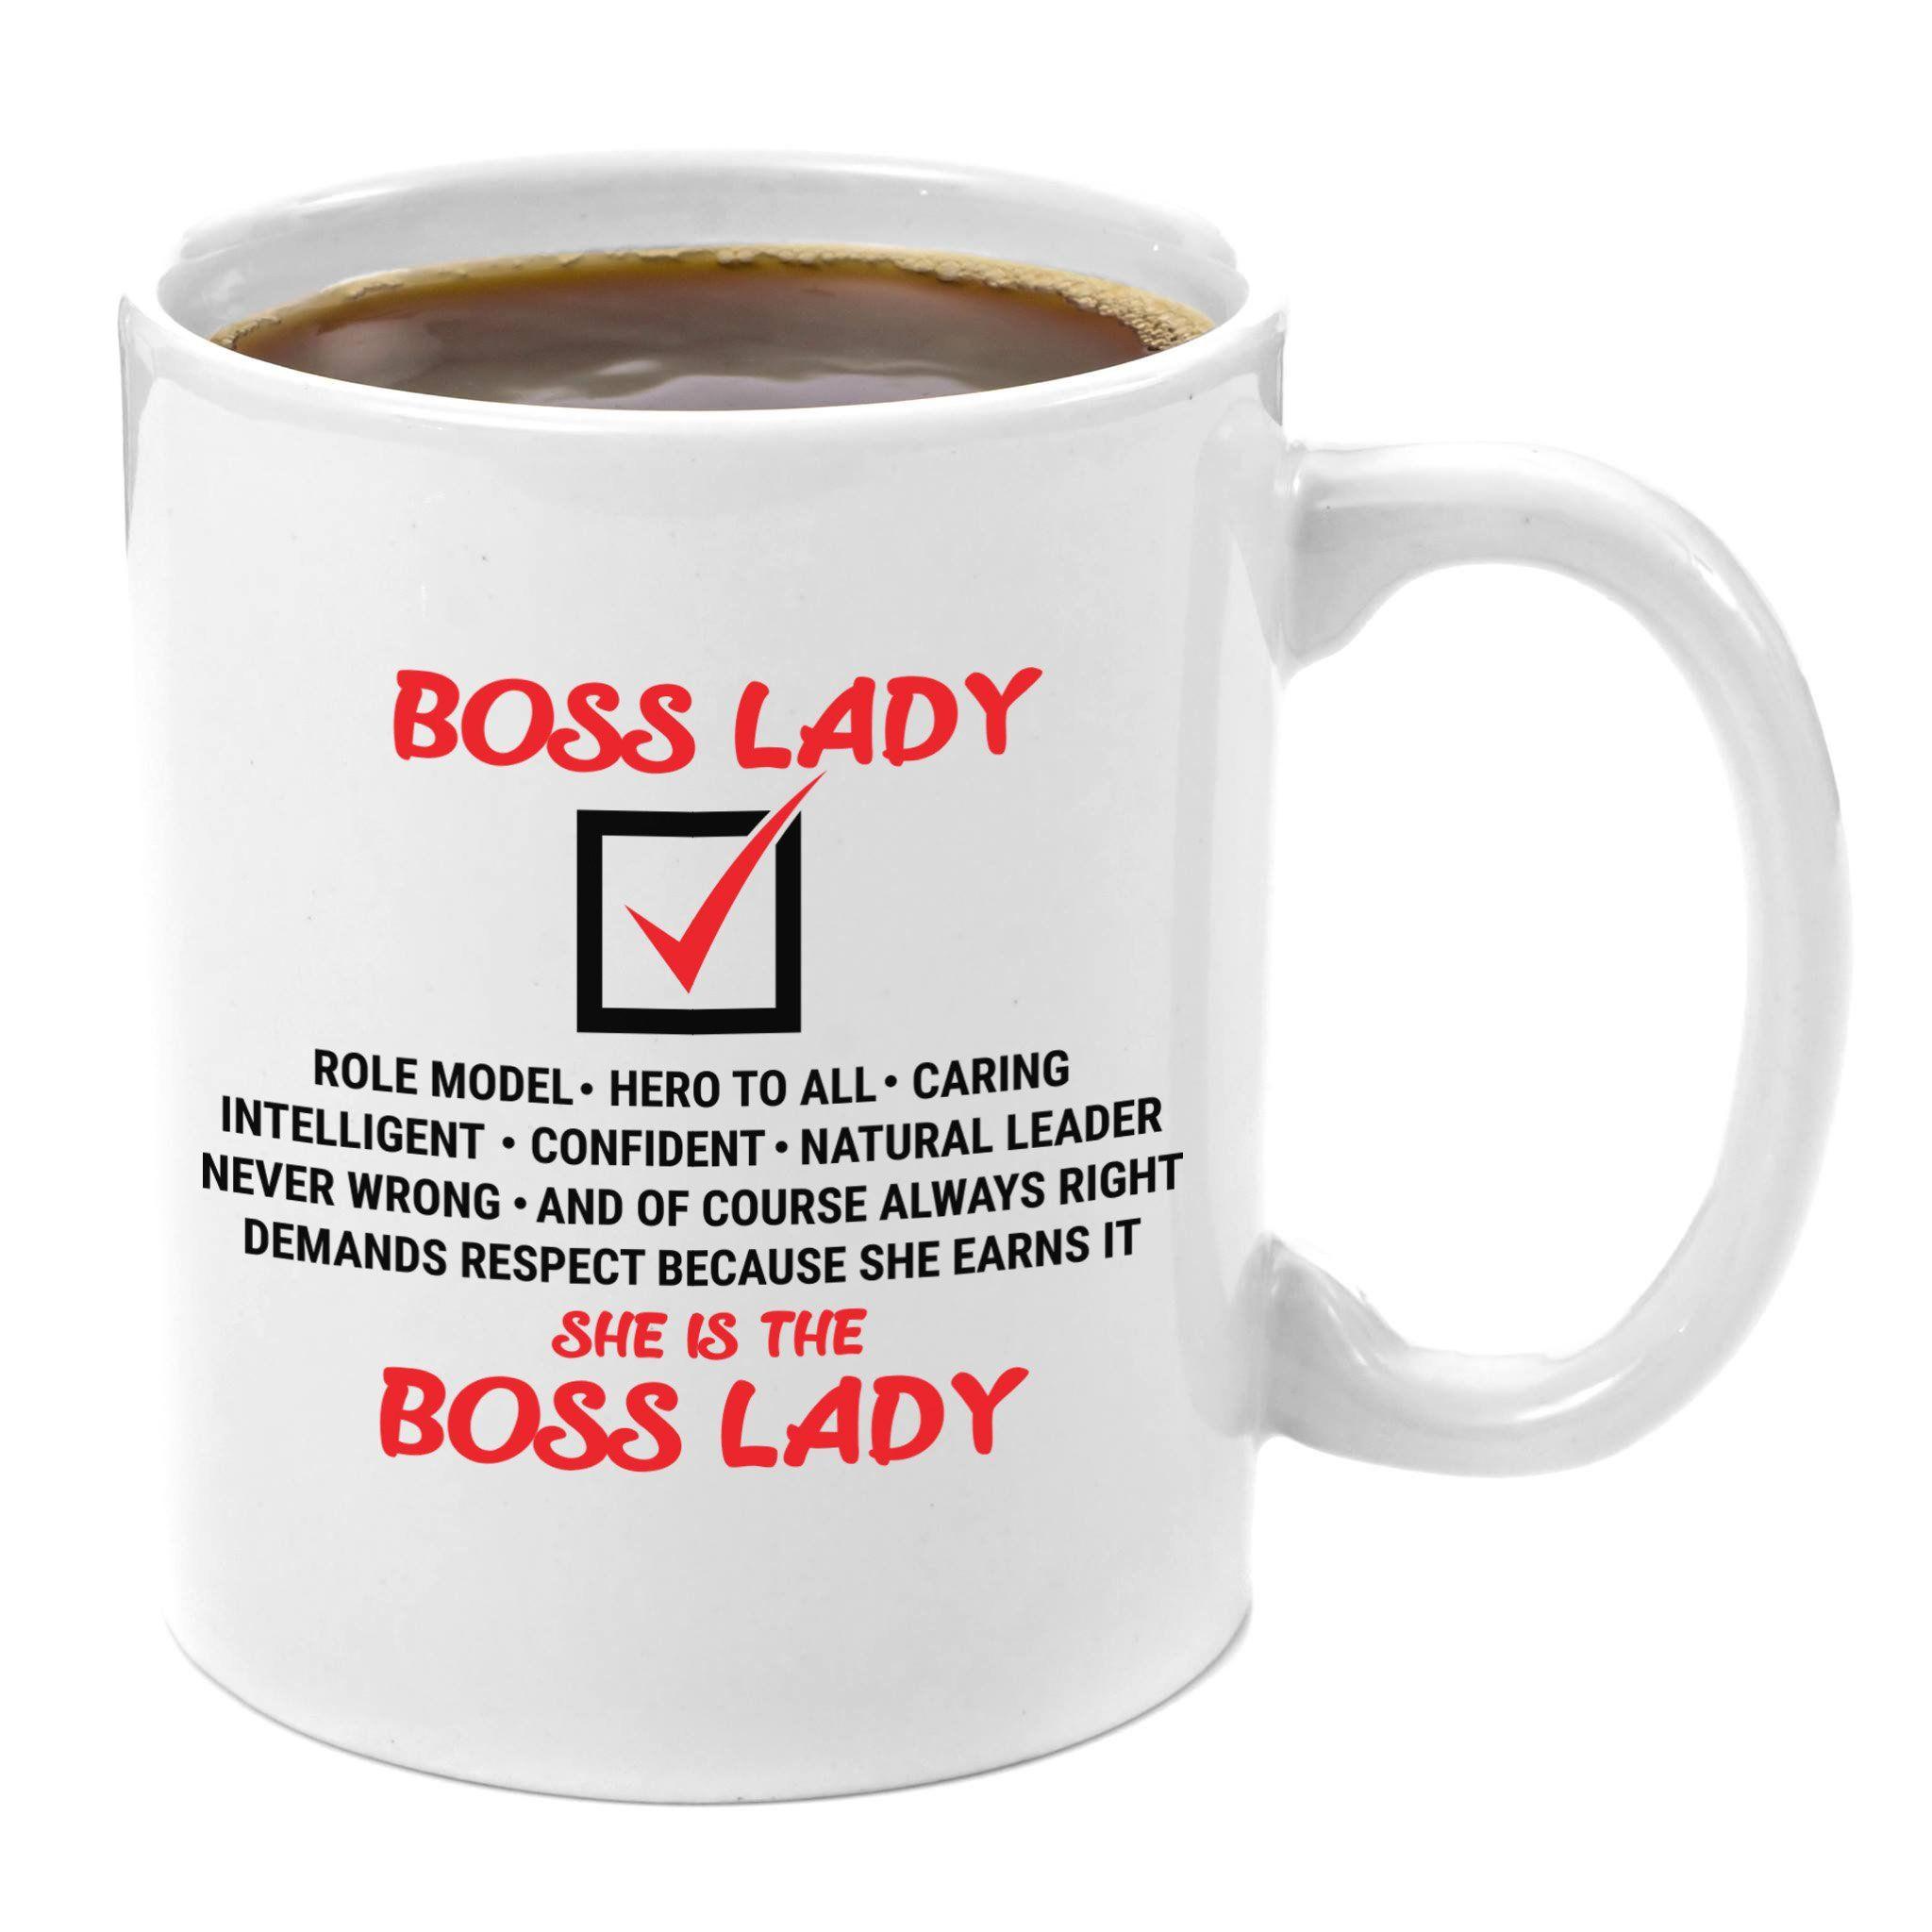 Boss lady premium 11oz coffee mug gift perfect office